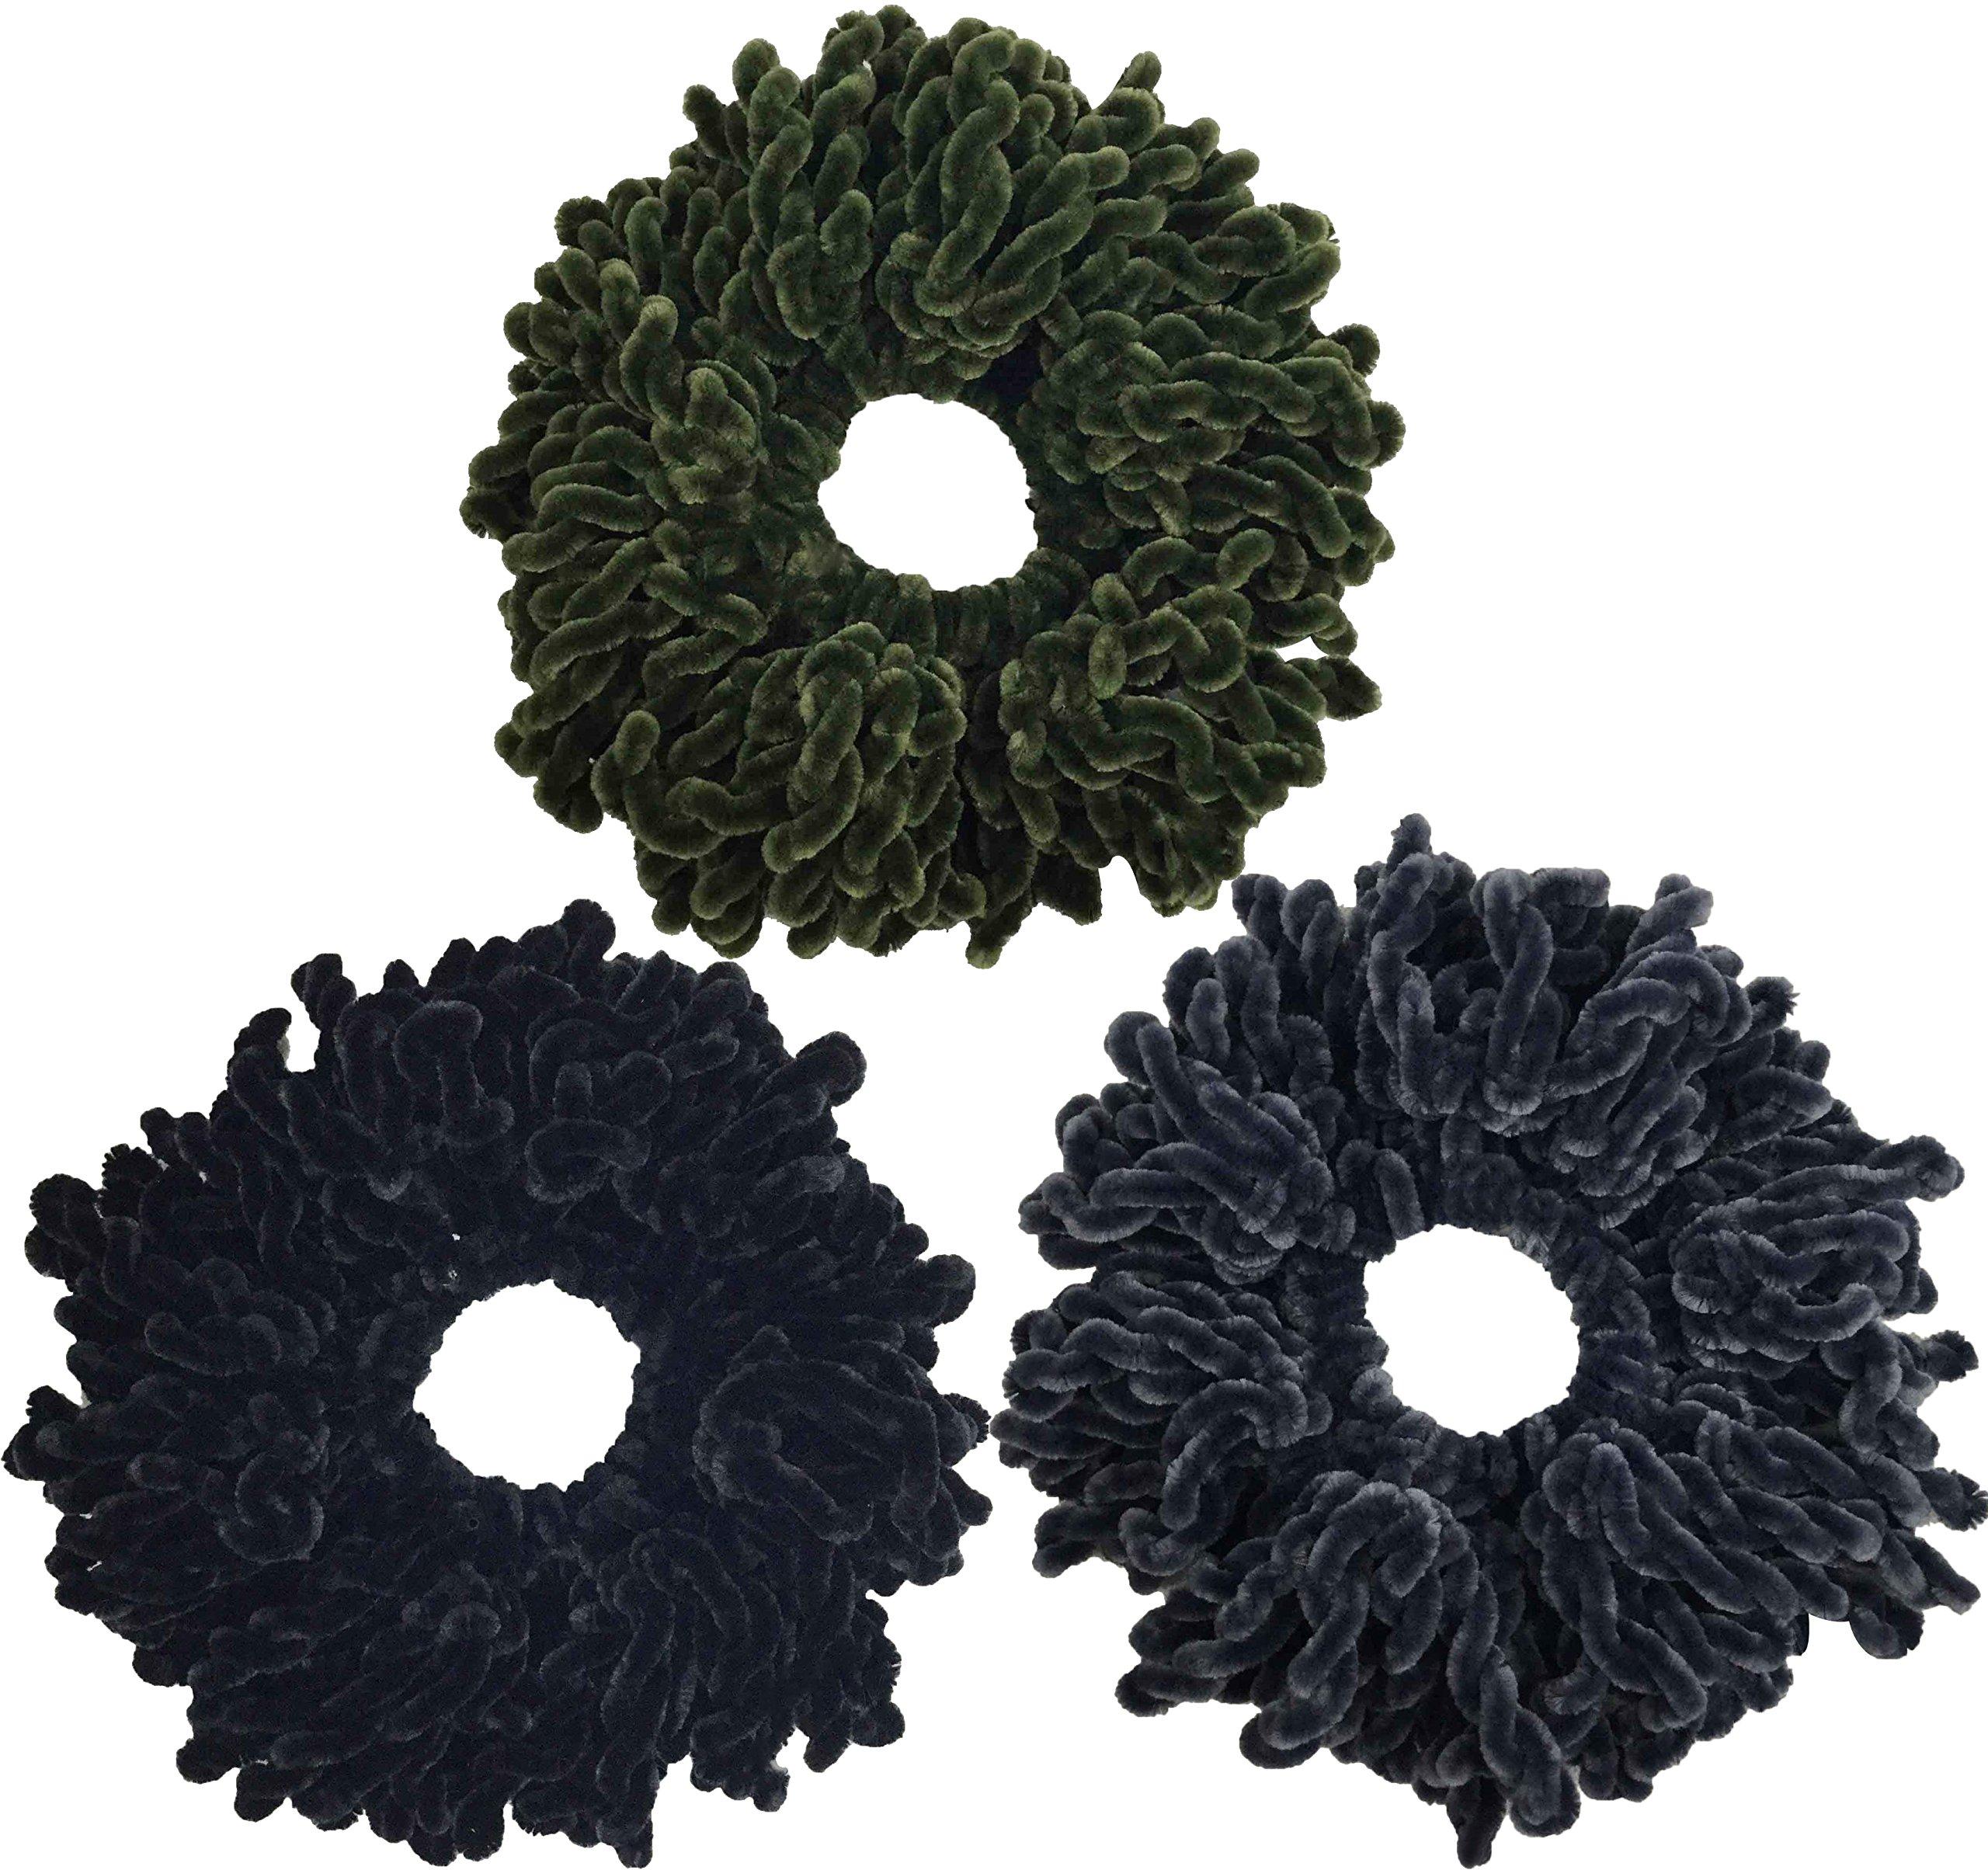 Ababalaya Women's 3pcs Volumising Scrunchie Big Hair Tie Ring Hijab Volumizer Khaleeji Headwear,Black+Army Green+Gray